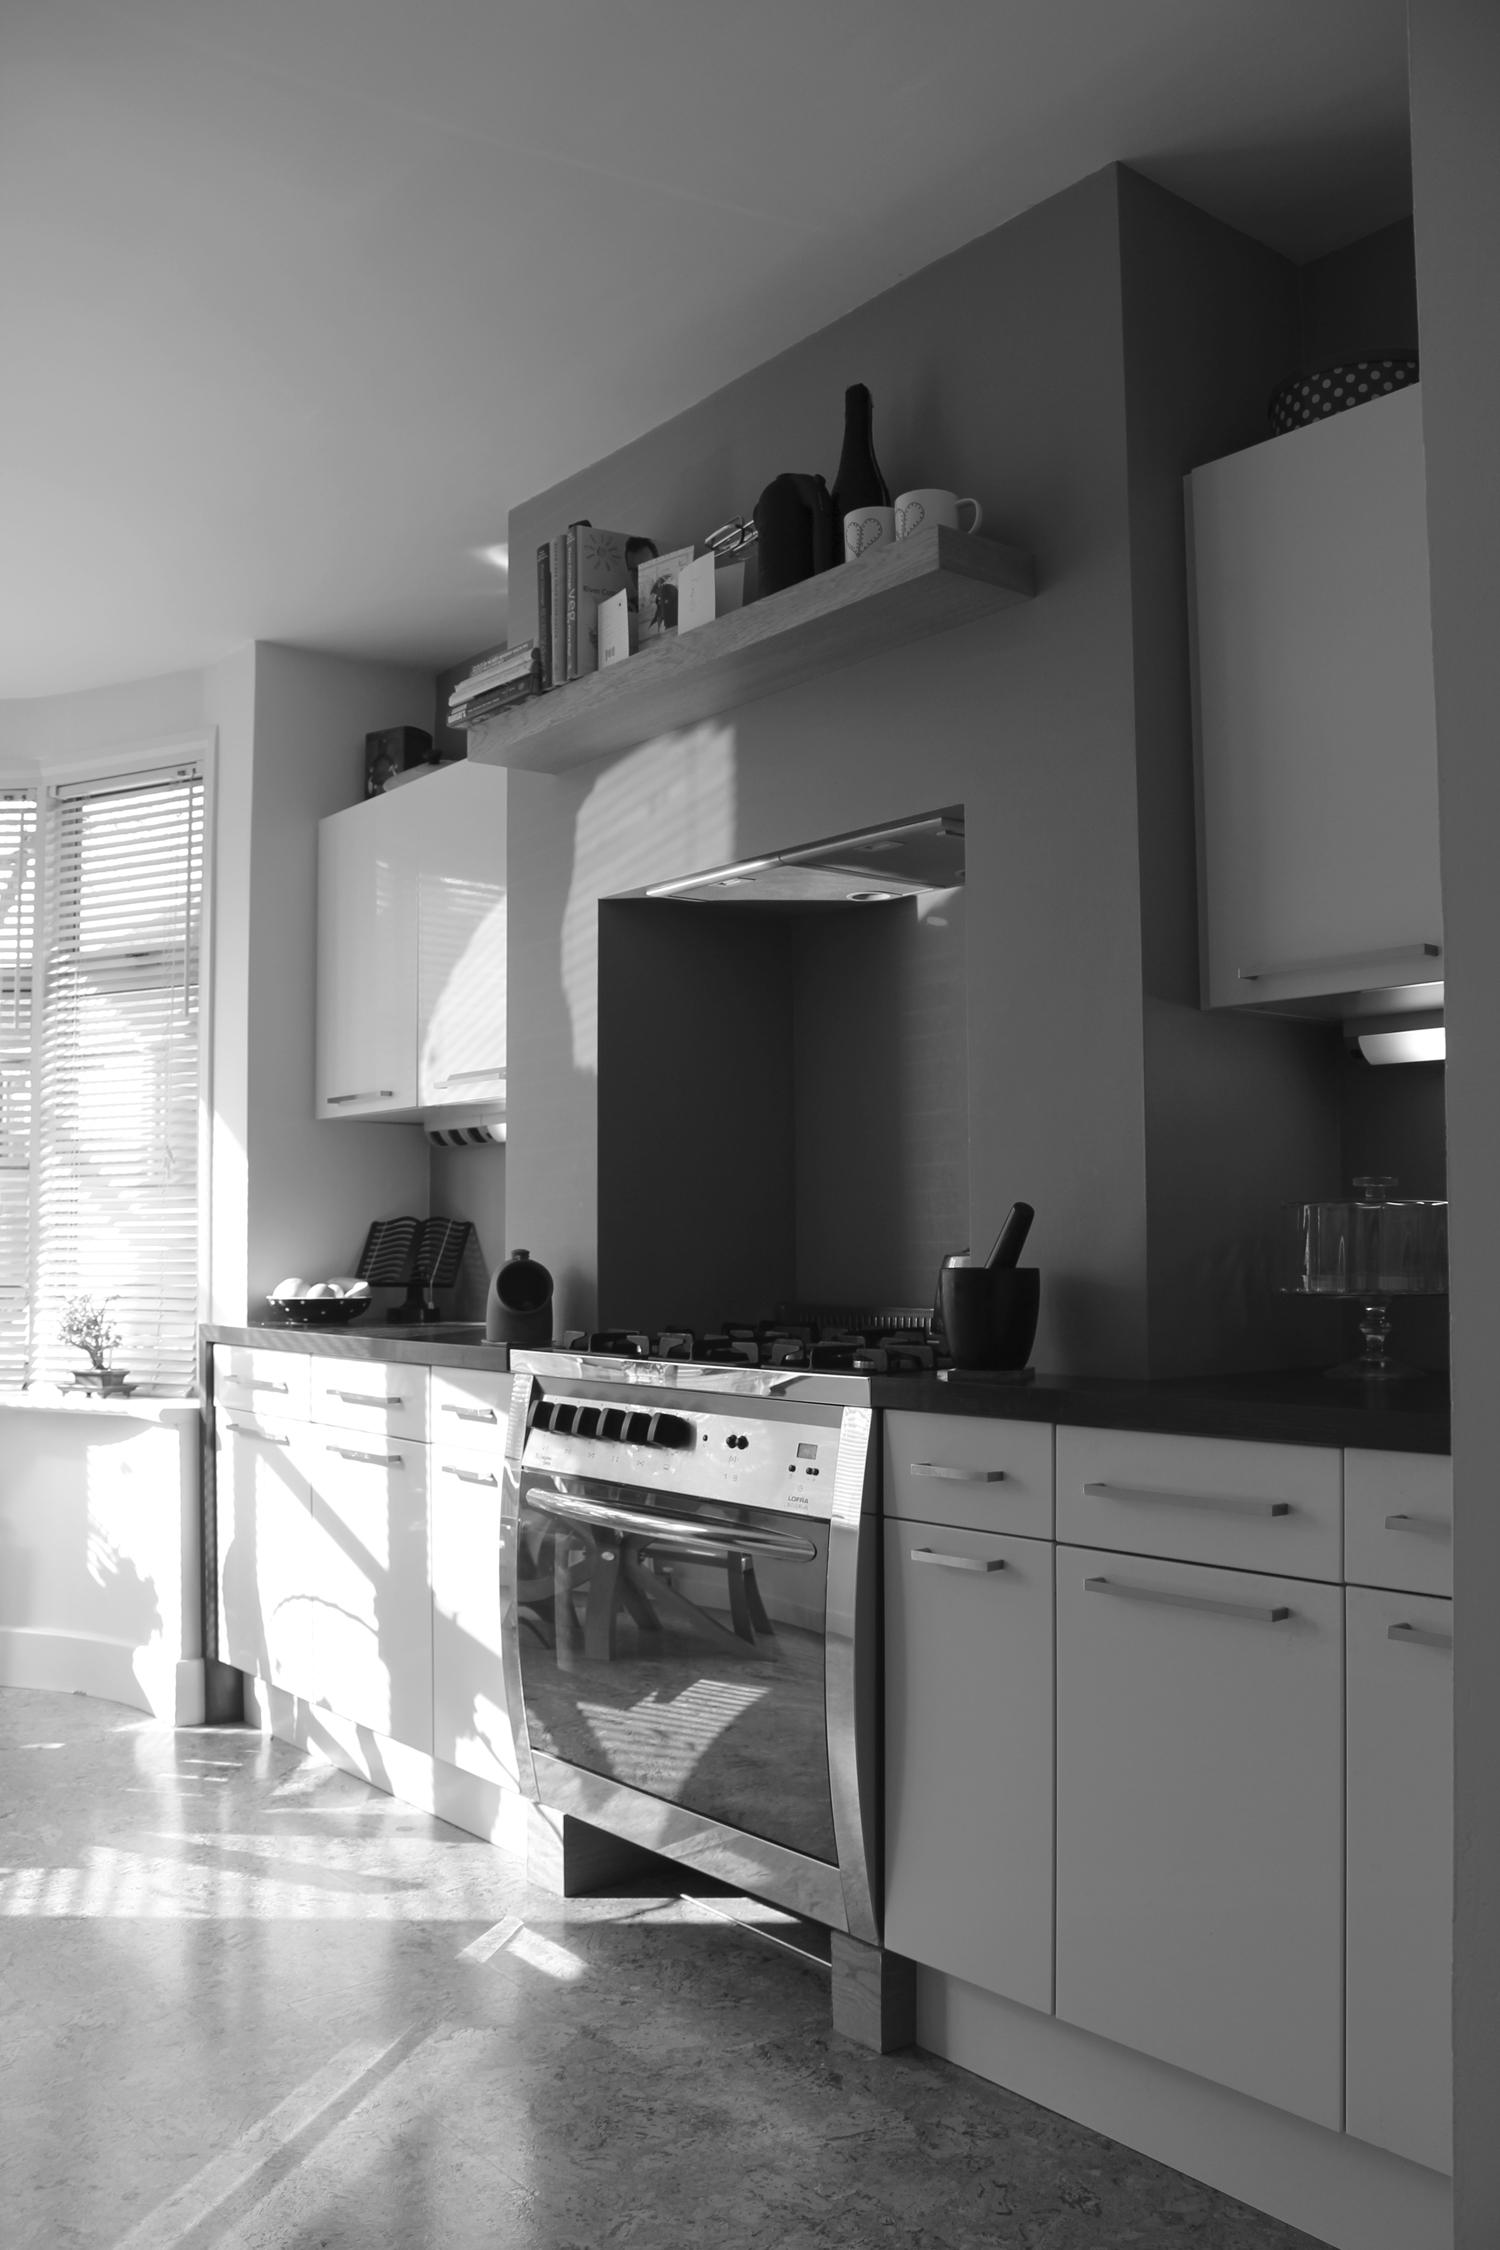 Quinton, Birmingham kitchen remodel